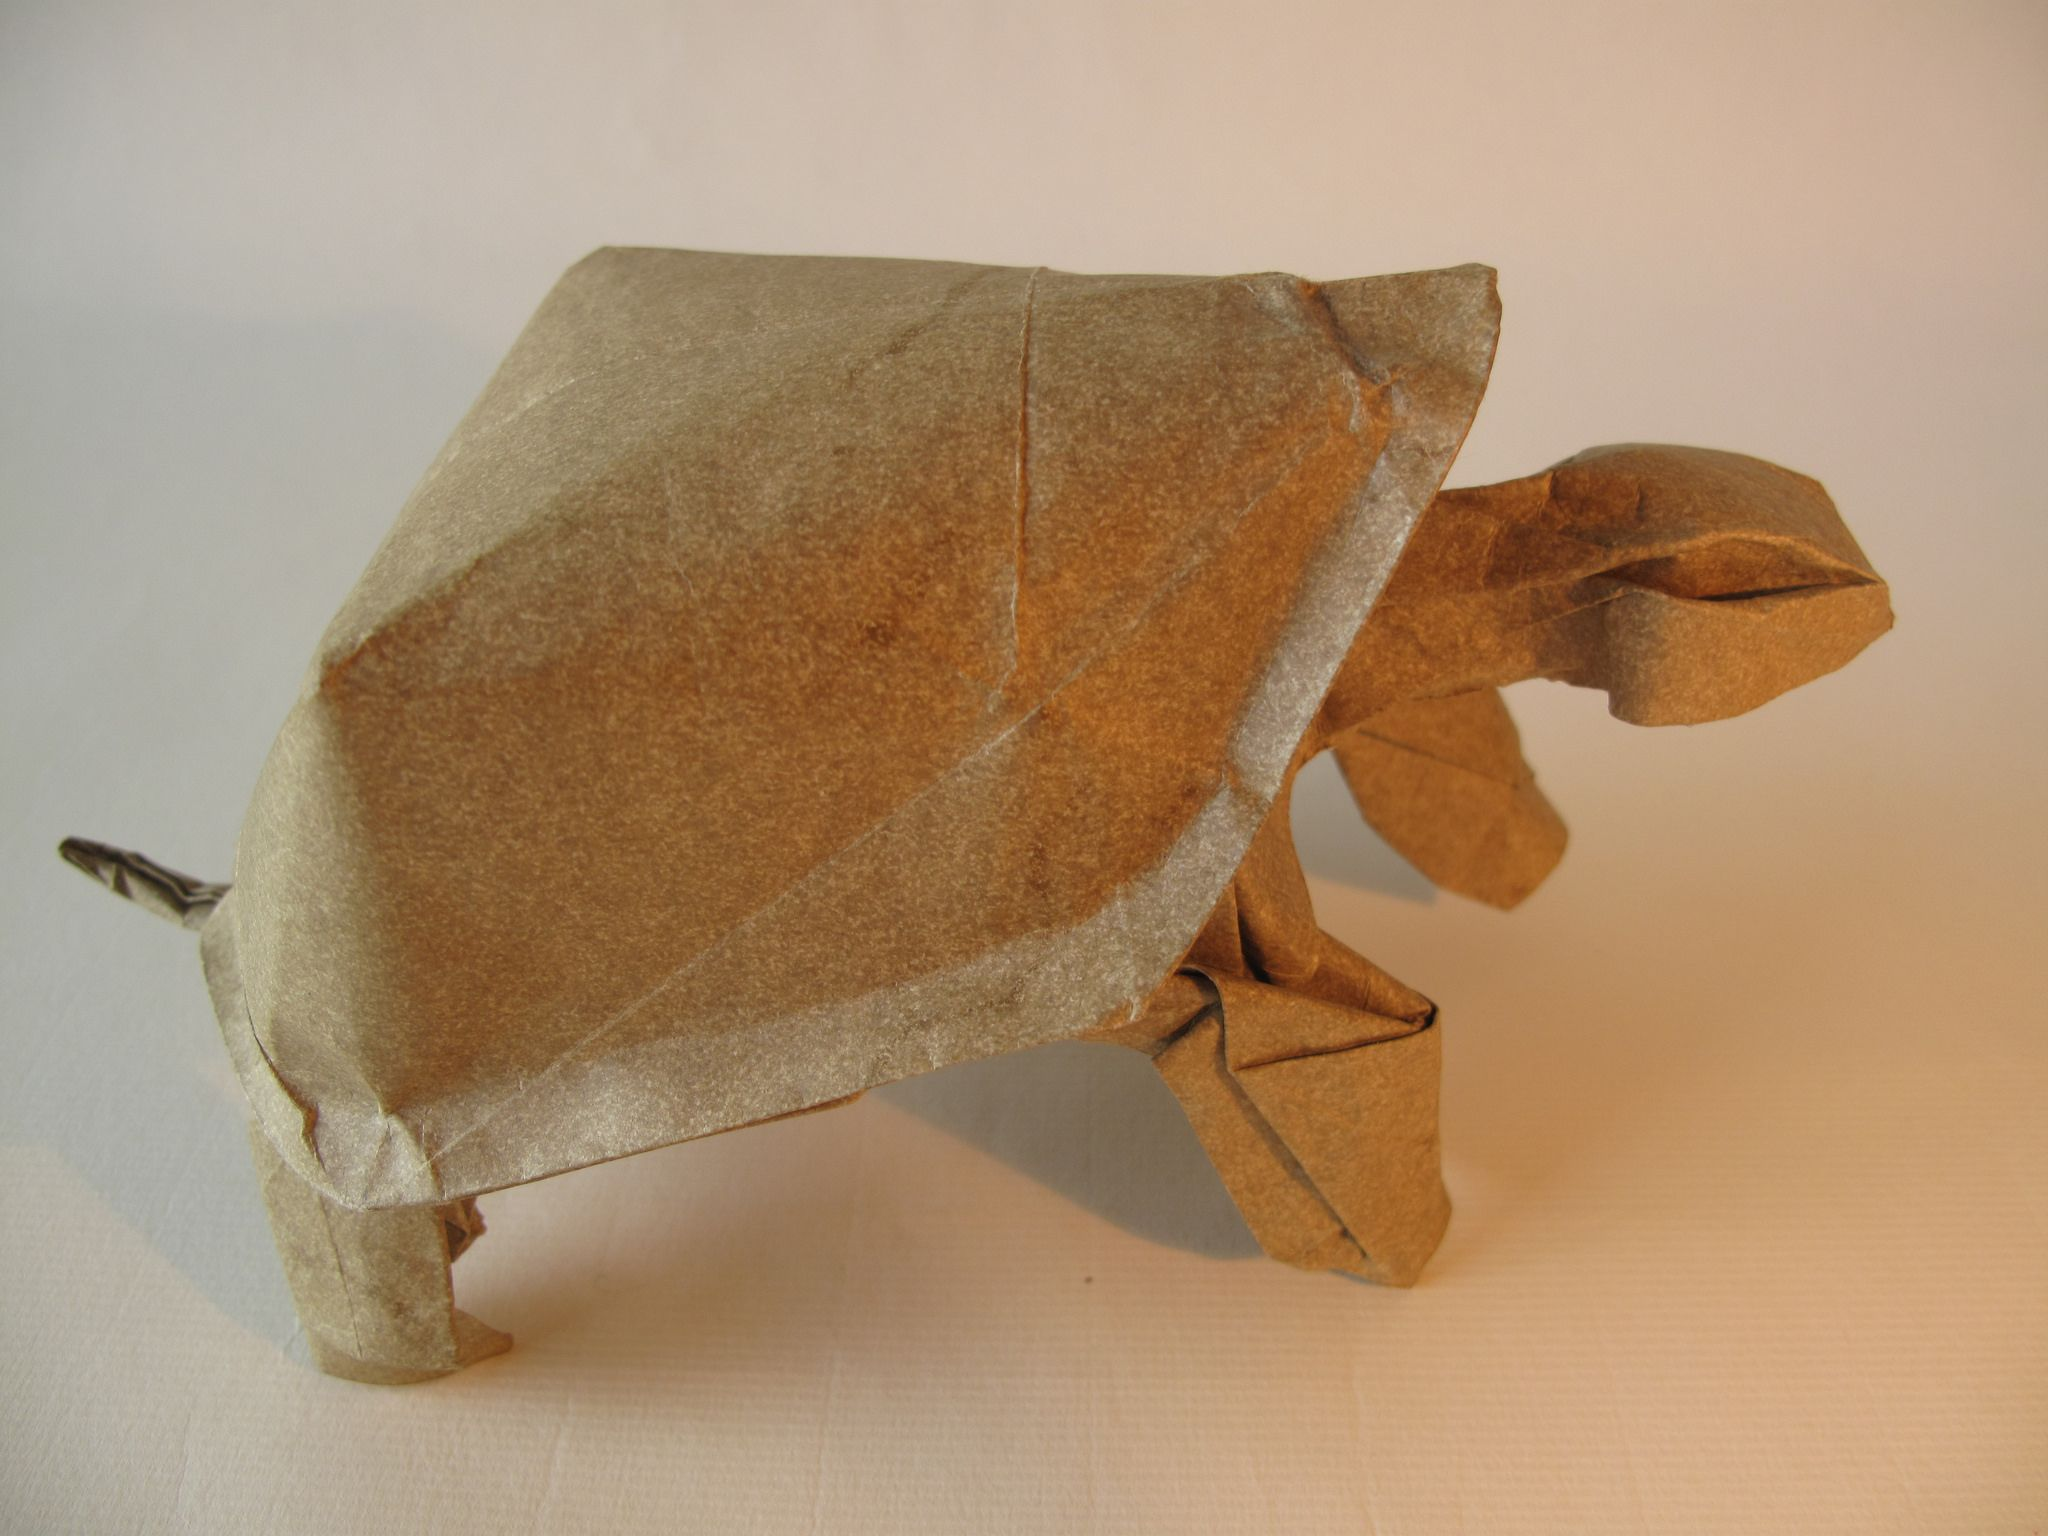 Tortoise nguyen hung cuong nguyen hung origami and tutorials httpsflicpkkkl8r tortoise nguyen hung jeuxipadfo Image collections